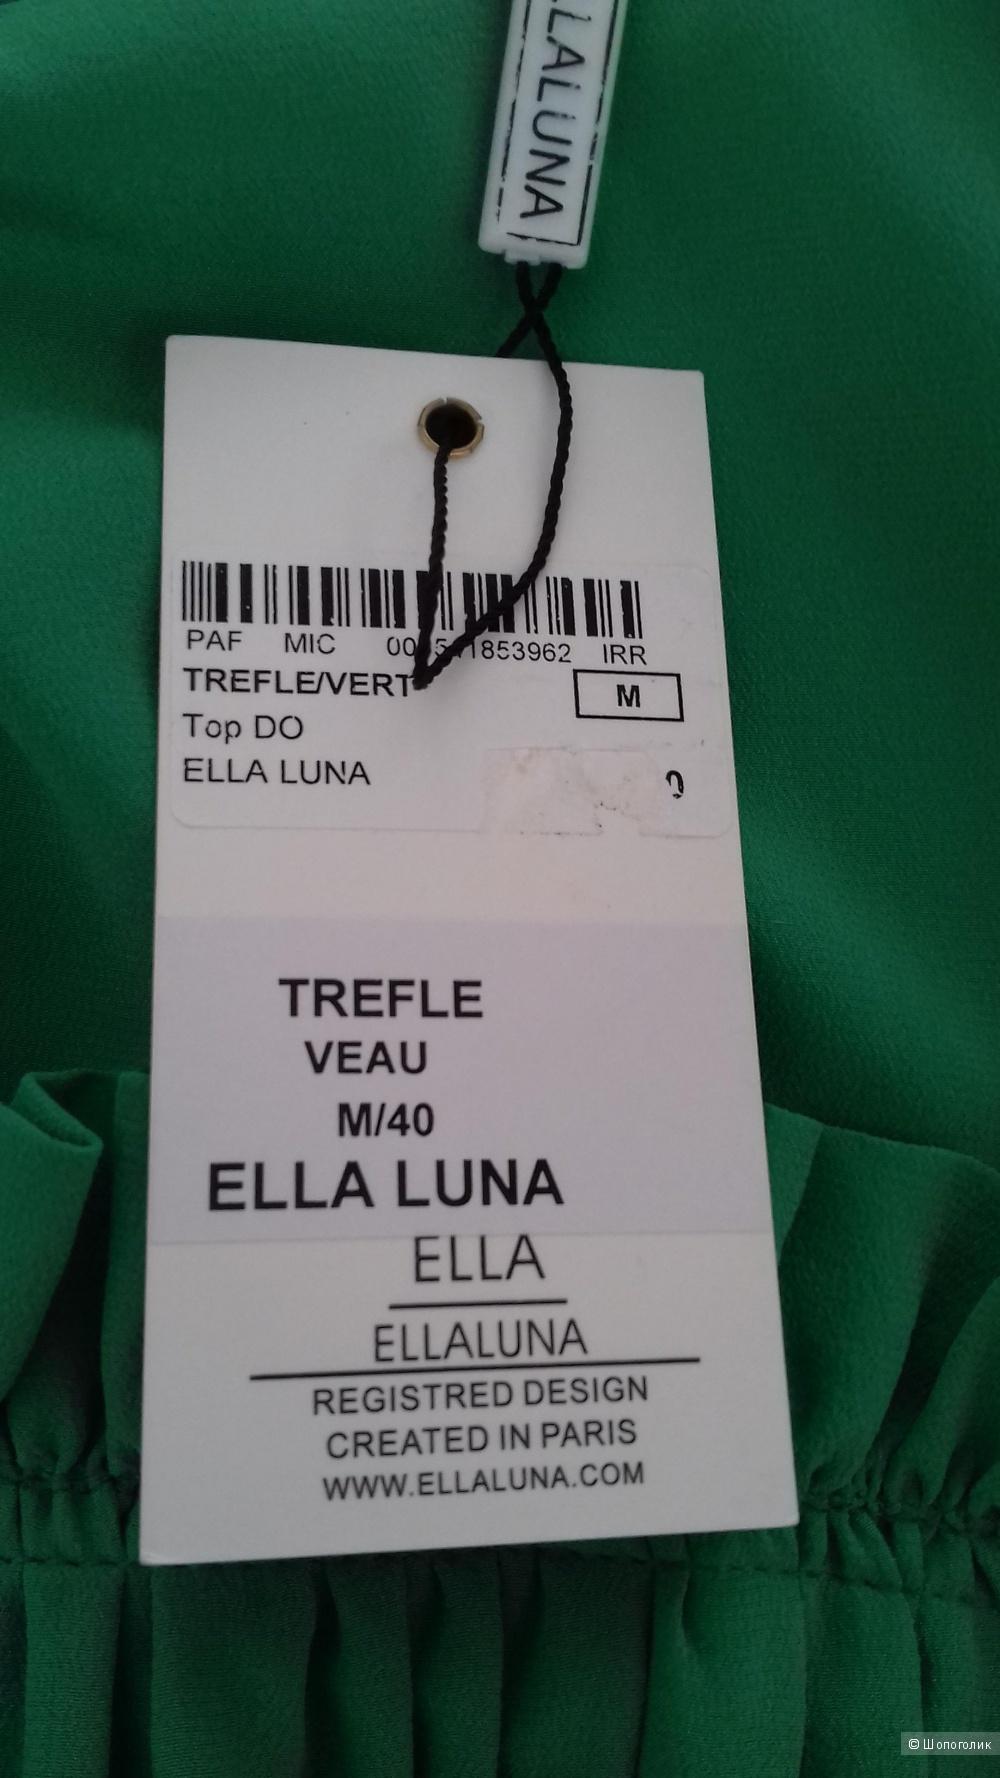 Шёлковая блуза ELLA LUNA Paris, Франция, размер 42 - 44-46